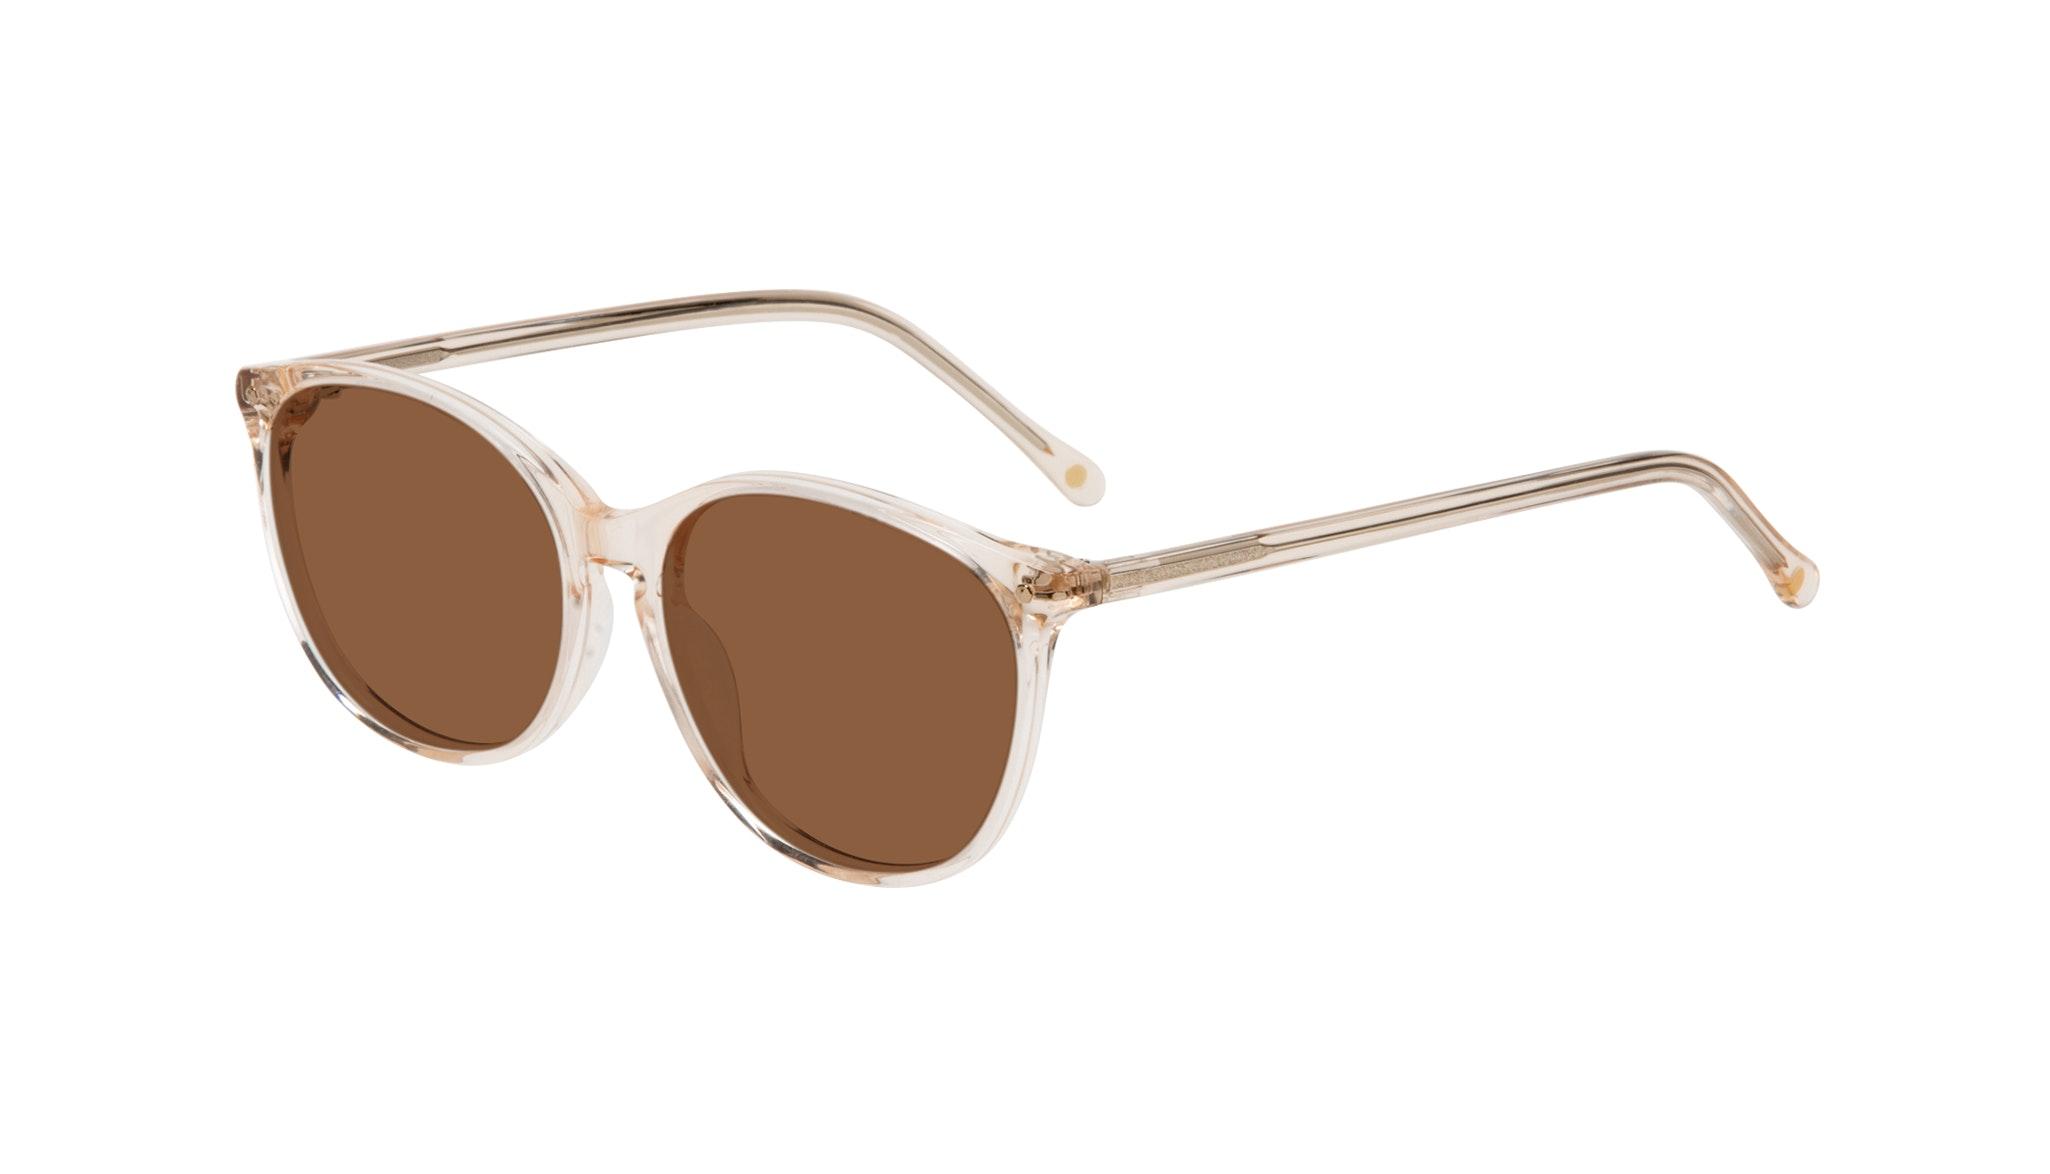 Affordable Fashion Glasses Rectangle Square Round Sunglasses Women Nadine Prosecco Tilt